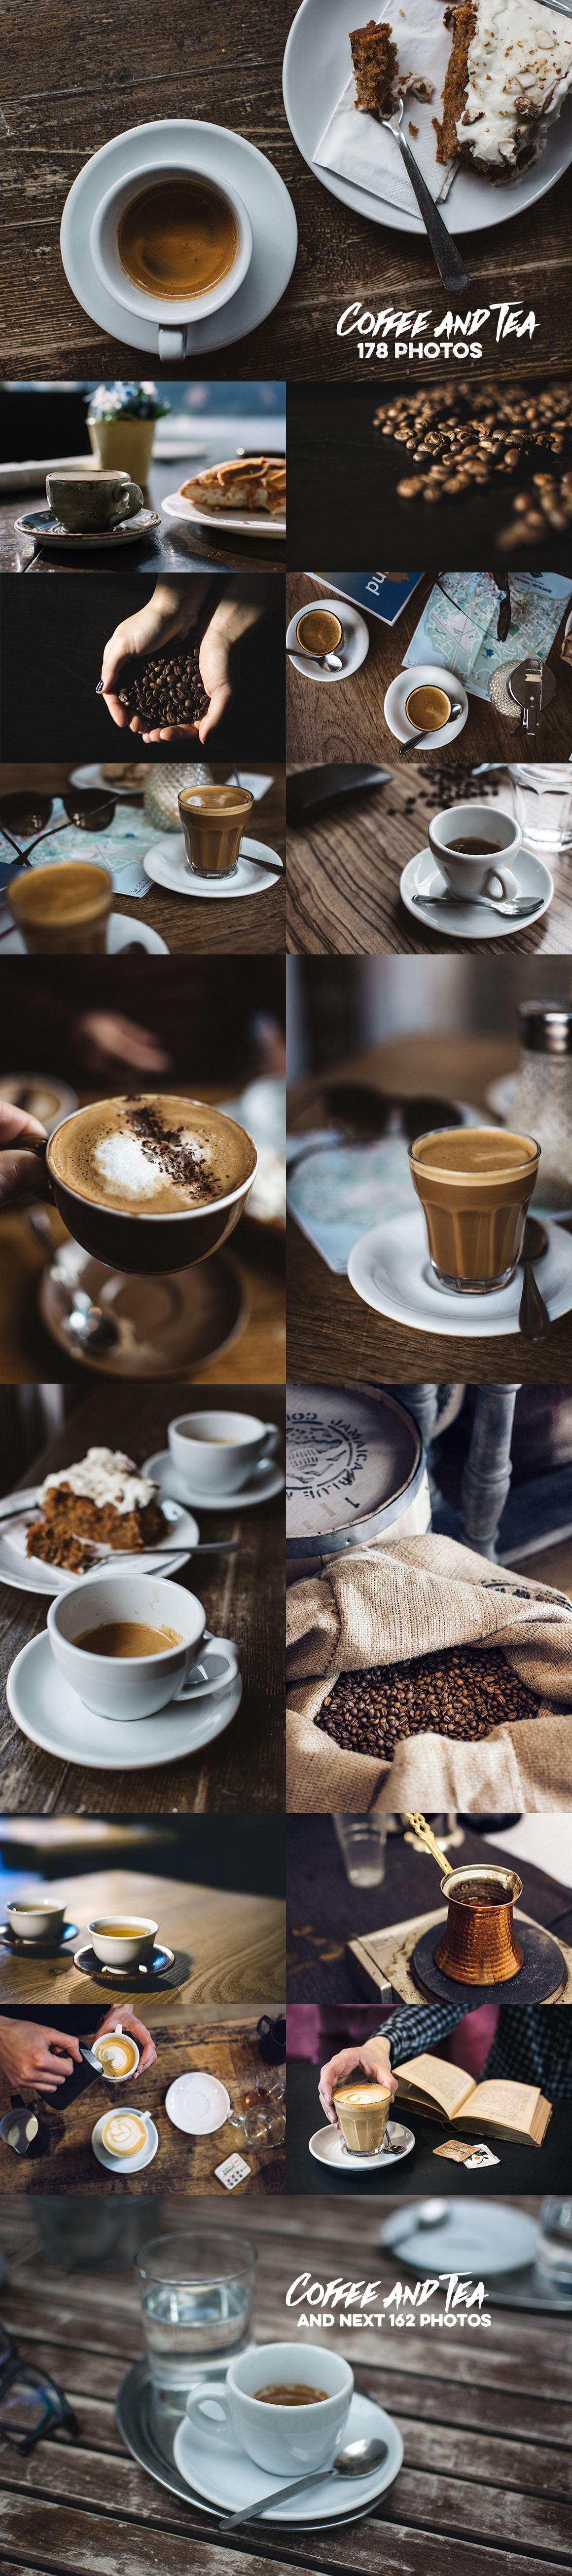 03coffeetea